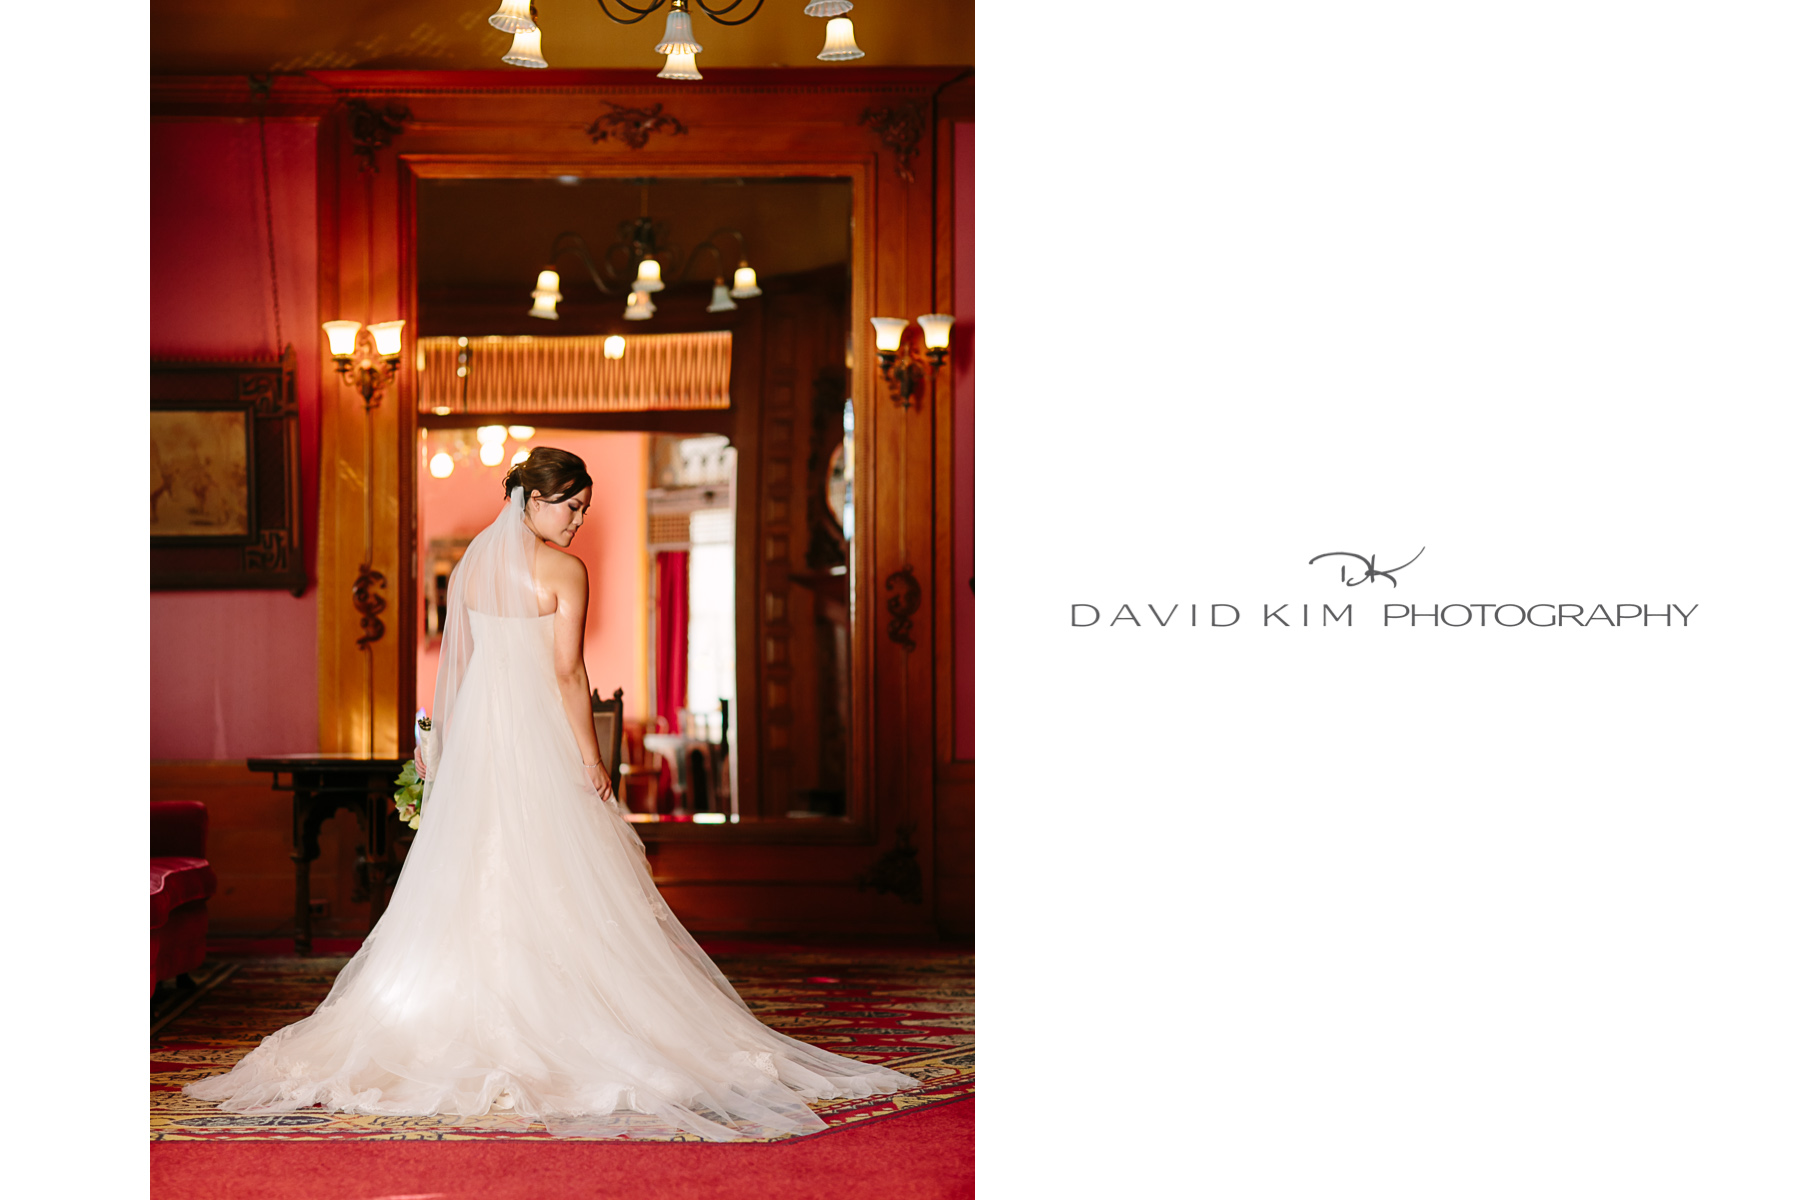 008-joann-alfred-david-kim-photography-castle-green-wedding-pasadena.jpg